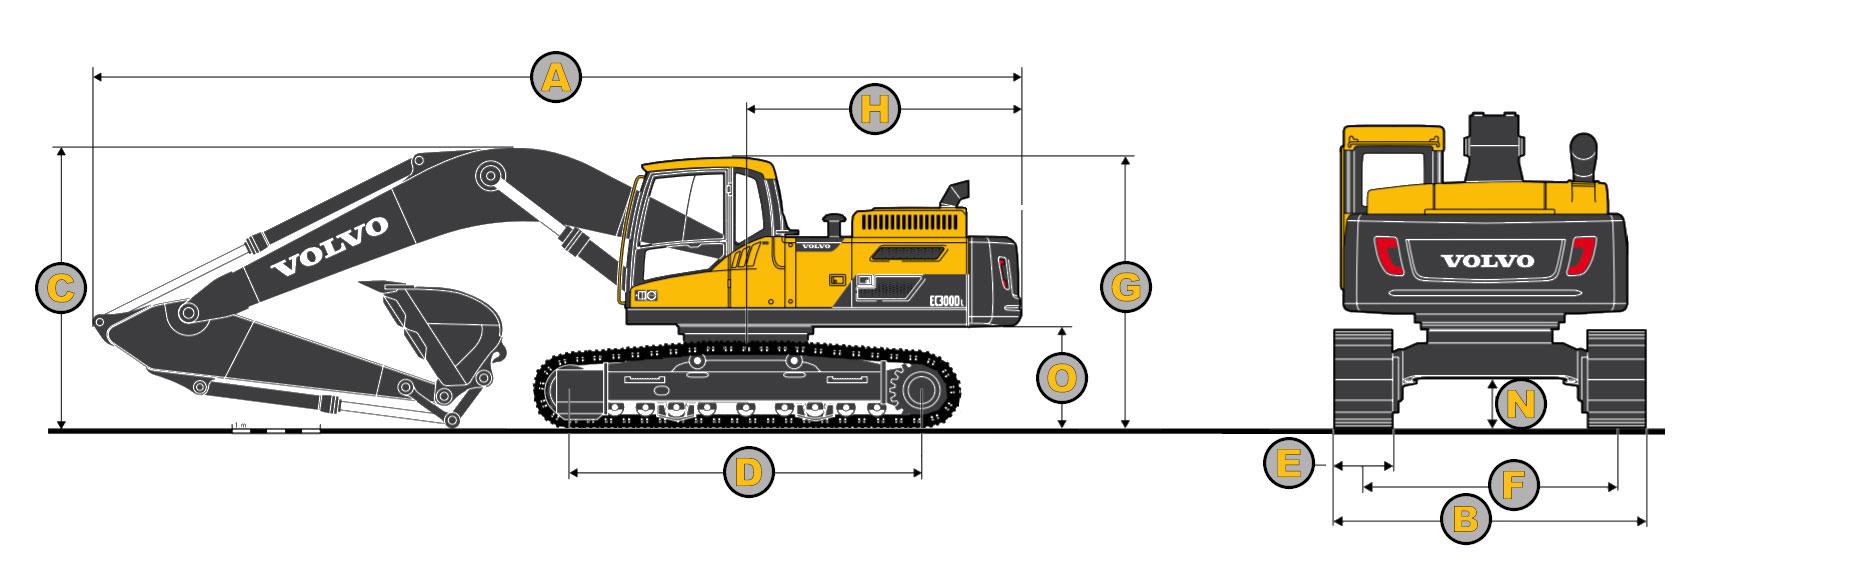 EC300DL-Diagram